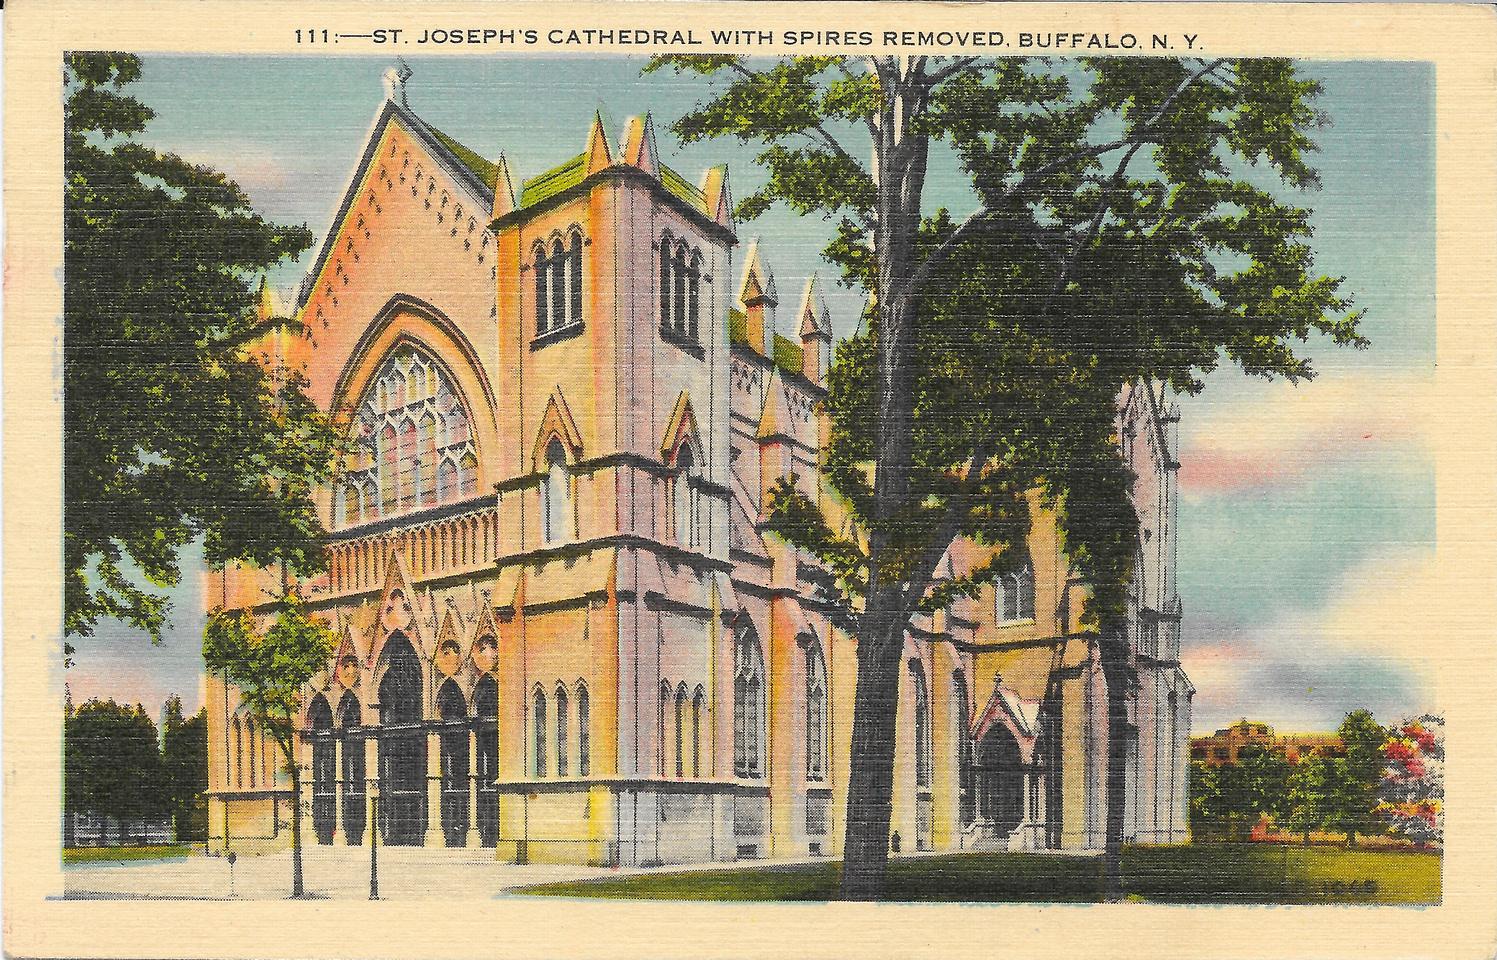 Michelle M. Murosky: The Postcard Collection &emdash; August 5, 1945